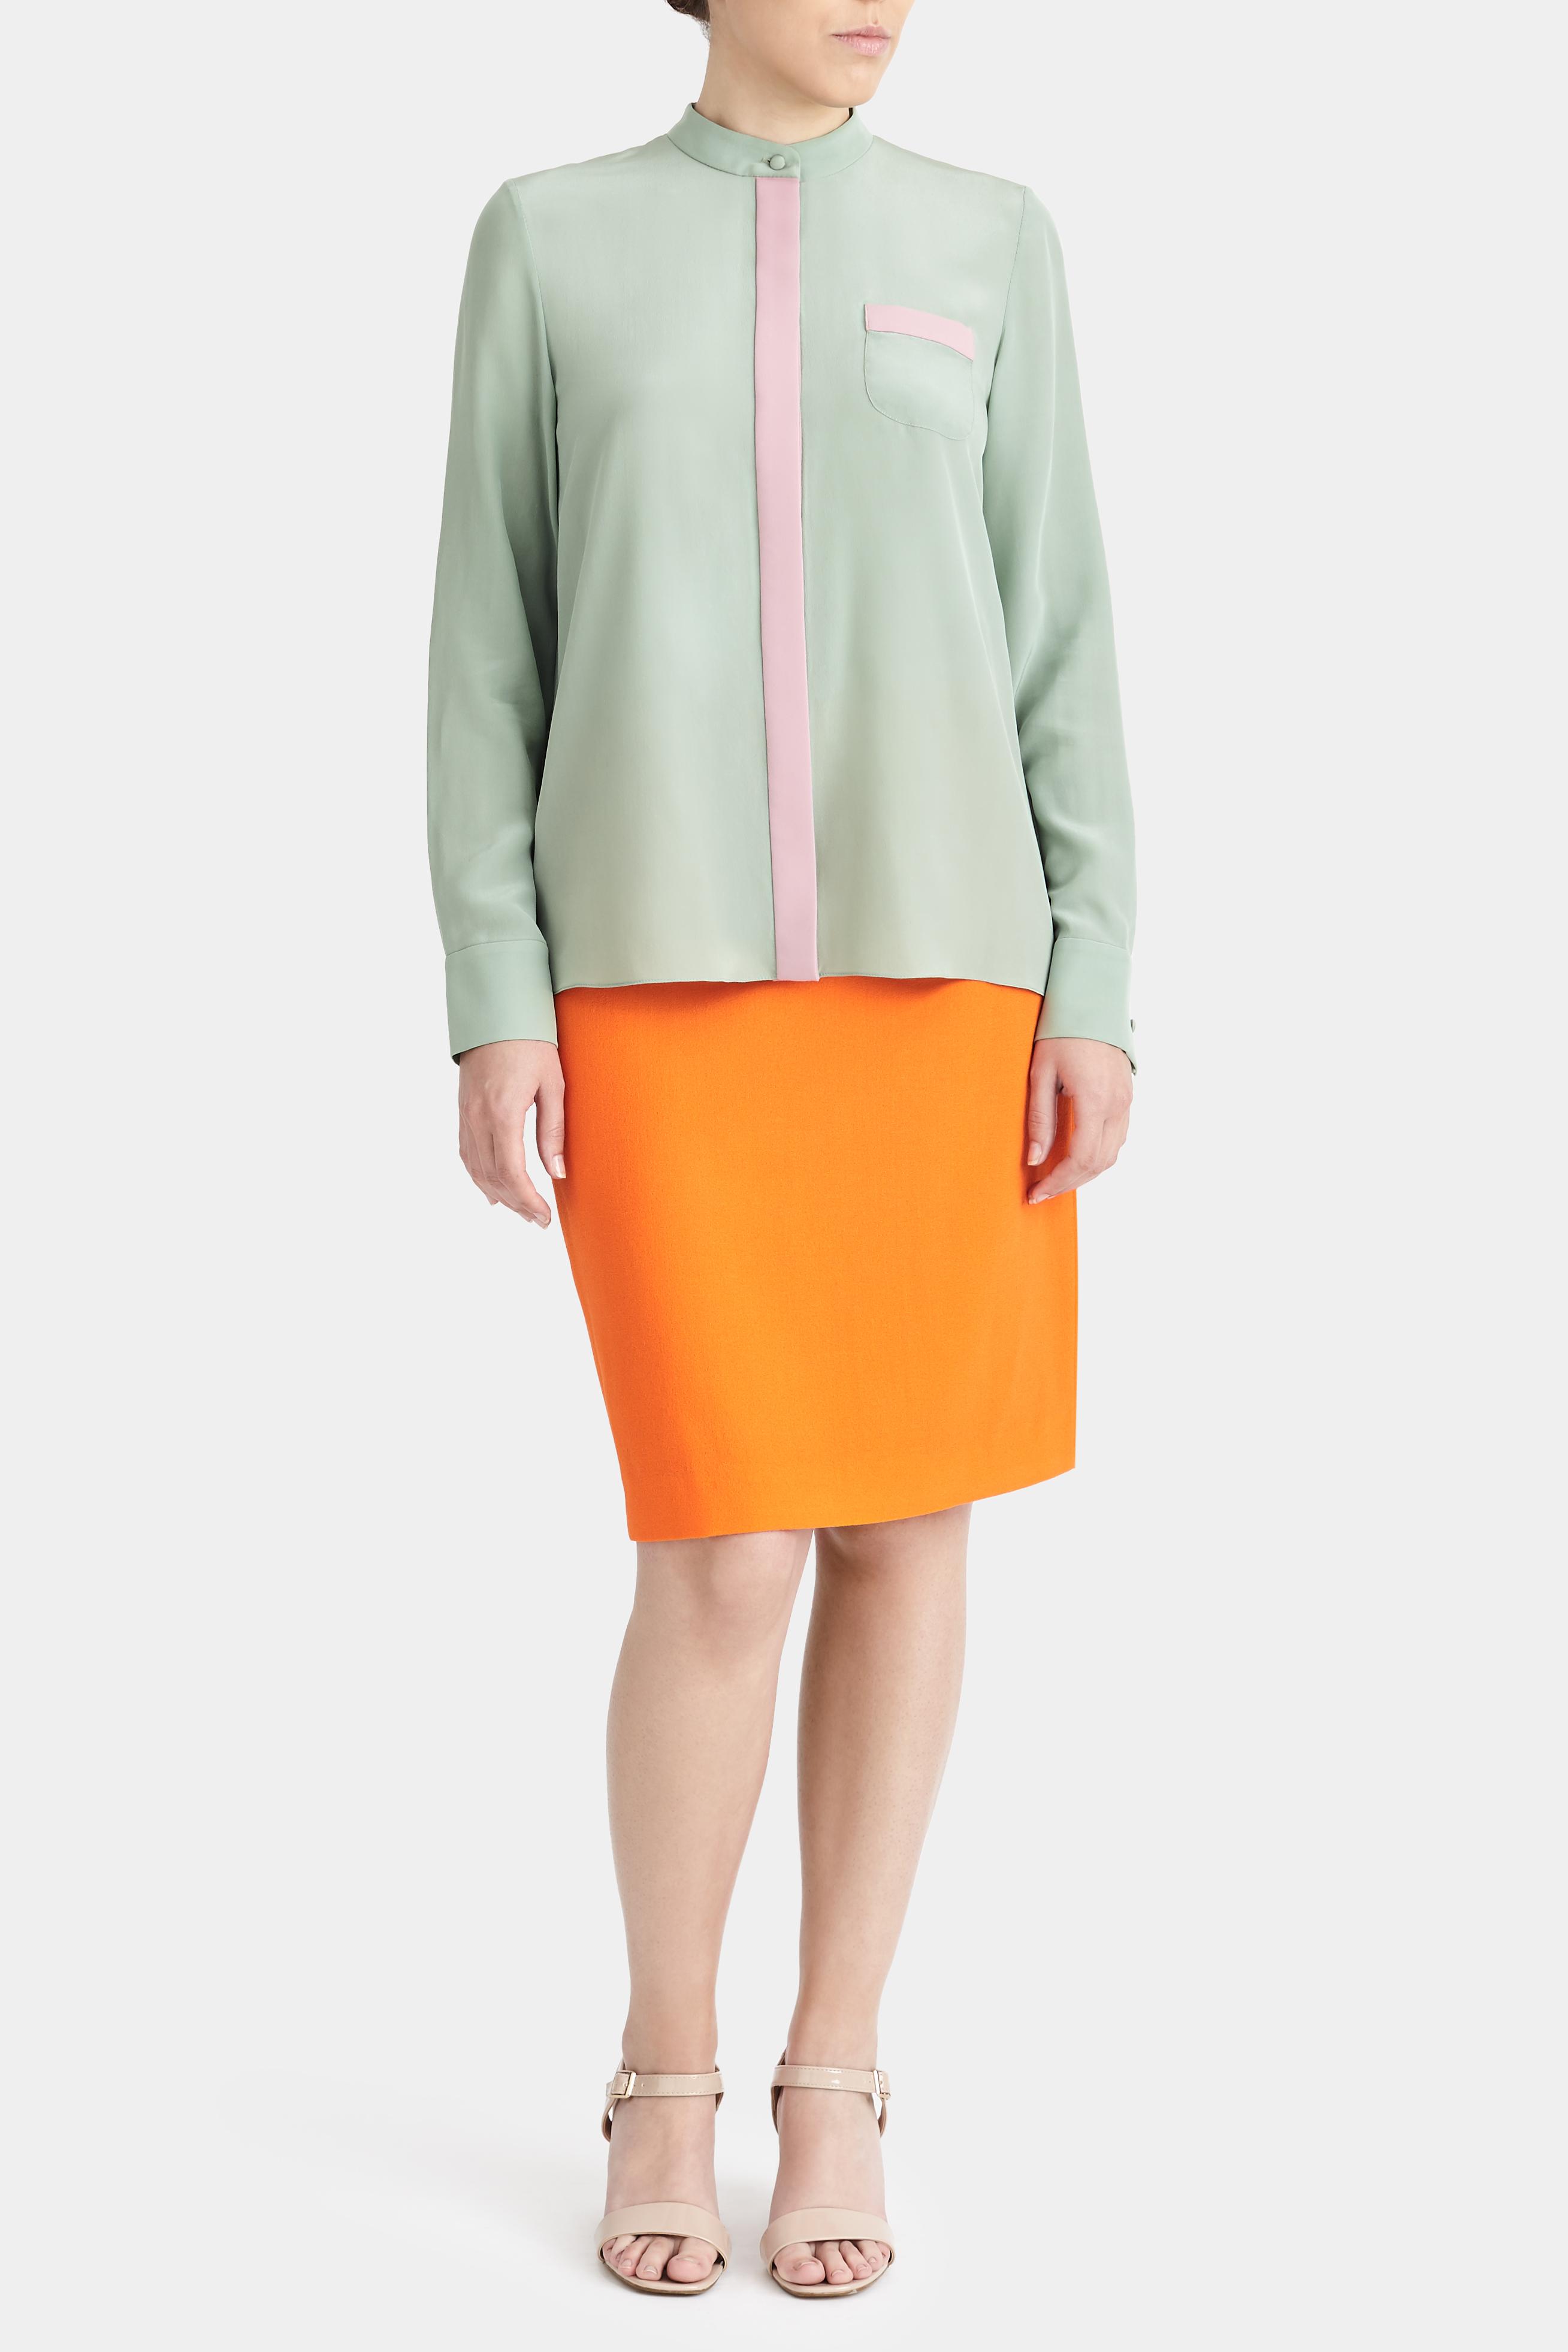 Dhalia Skirt by Bozena Jankowska on curated-crowd.com